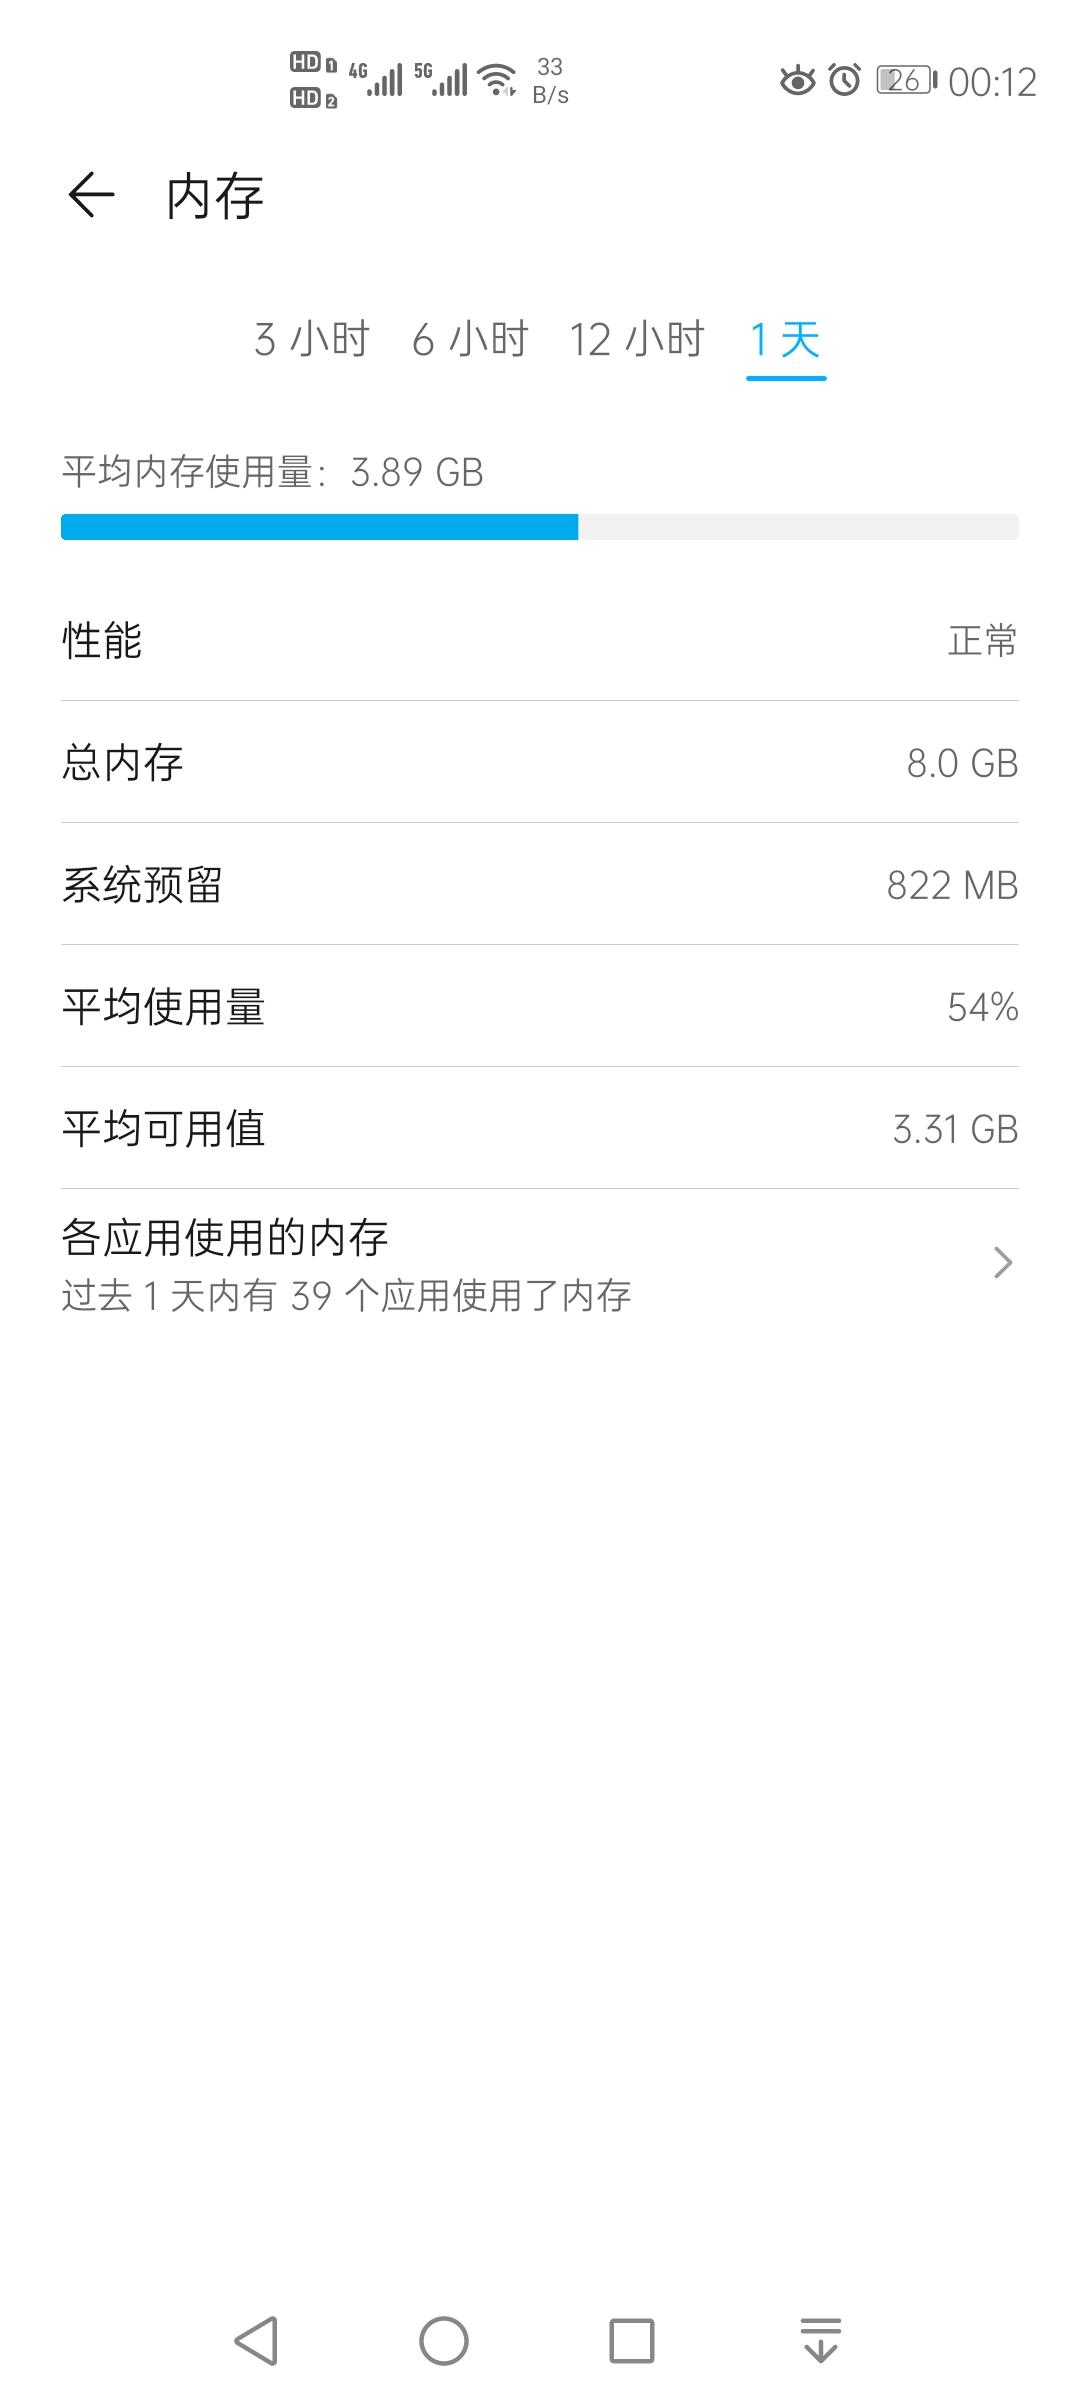 Screenshot_20200116_001206_com.android.settings.jpg